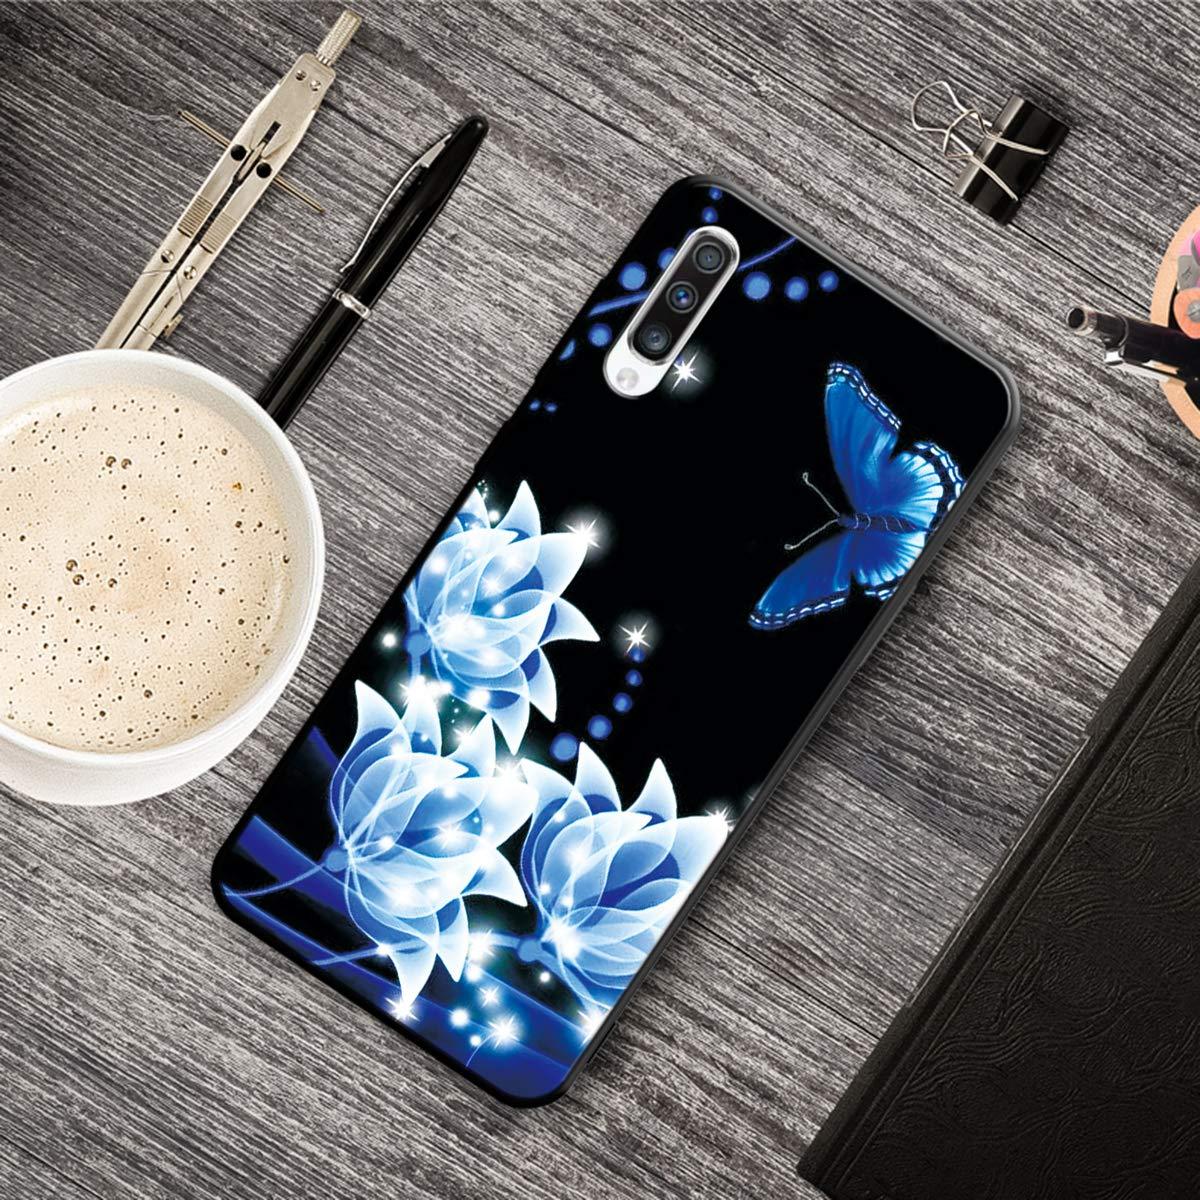 Ultra D/ünn Slim Weich TPU f/ür Samsung A50,Kreative Durchsichtiges Klar Transparent Flexible 3D Flower Cartoon Gel Gomma Sparkle Bling Glitter Silikon Schutz Handy Bumper